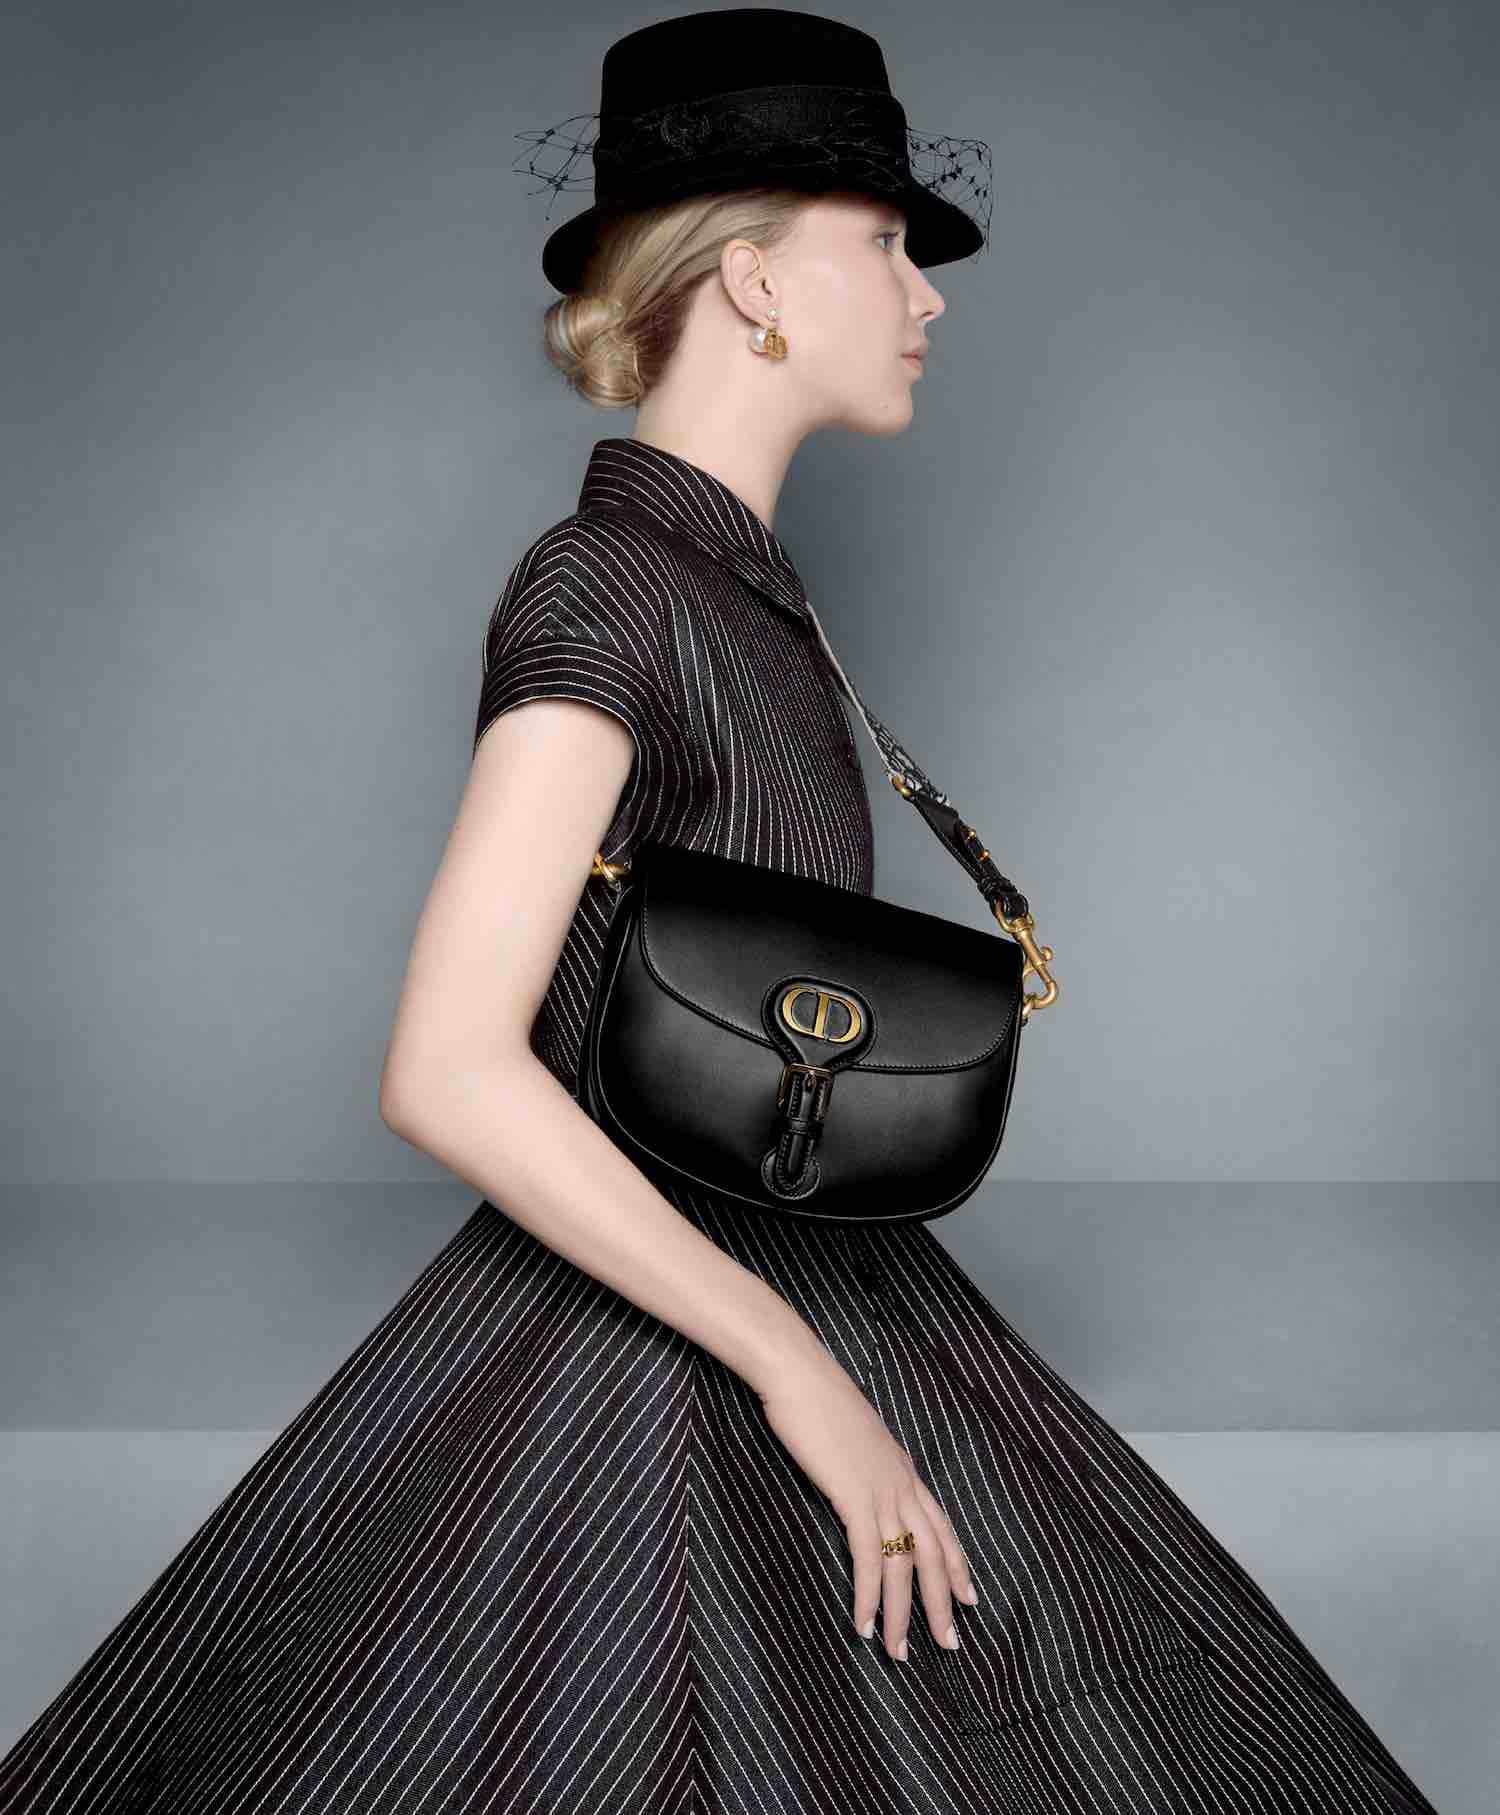 Dior Jennifer Lawrence